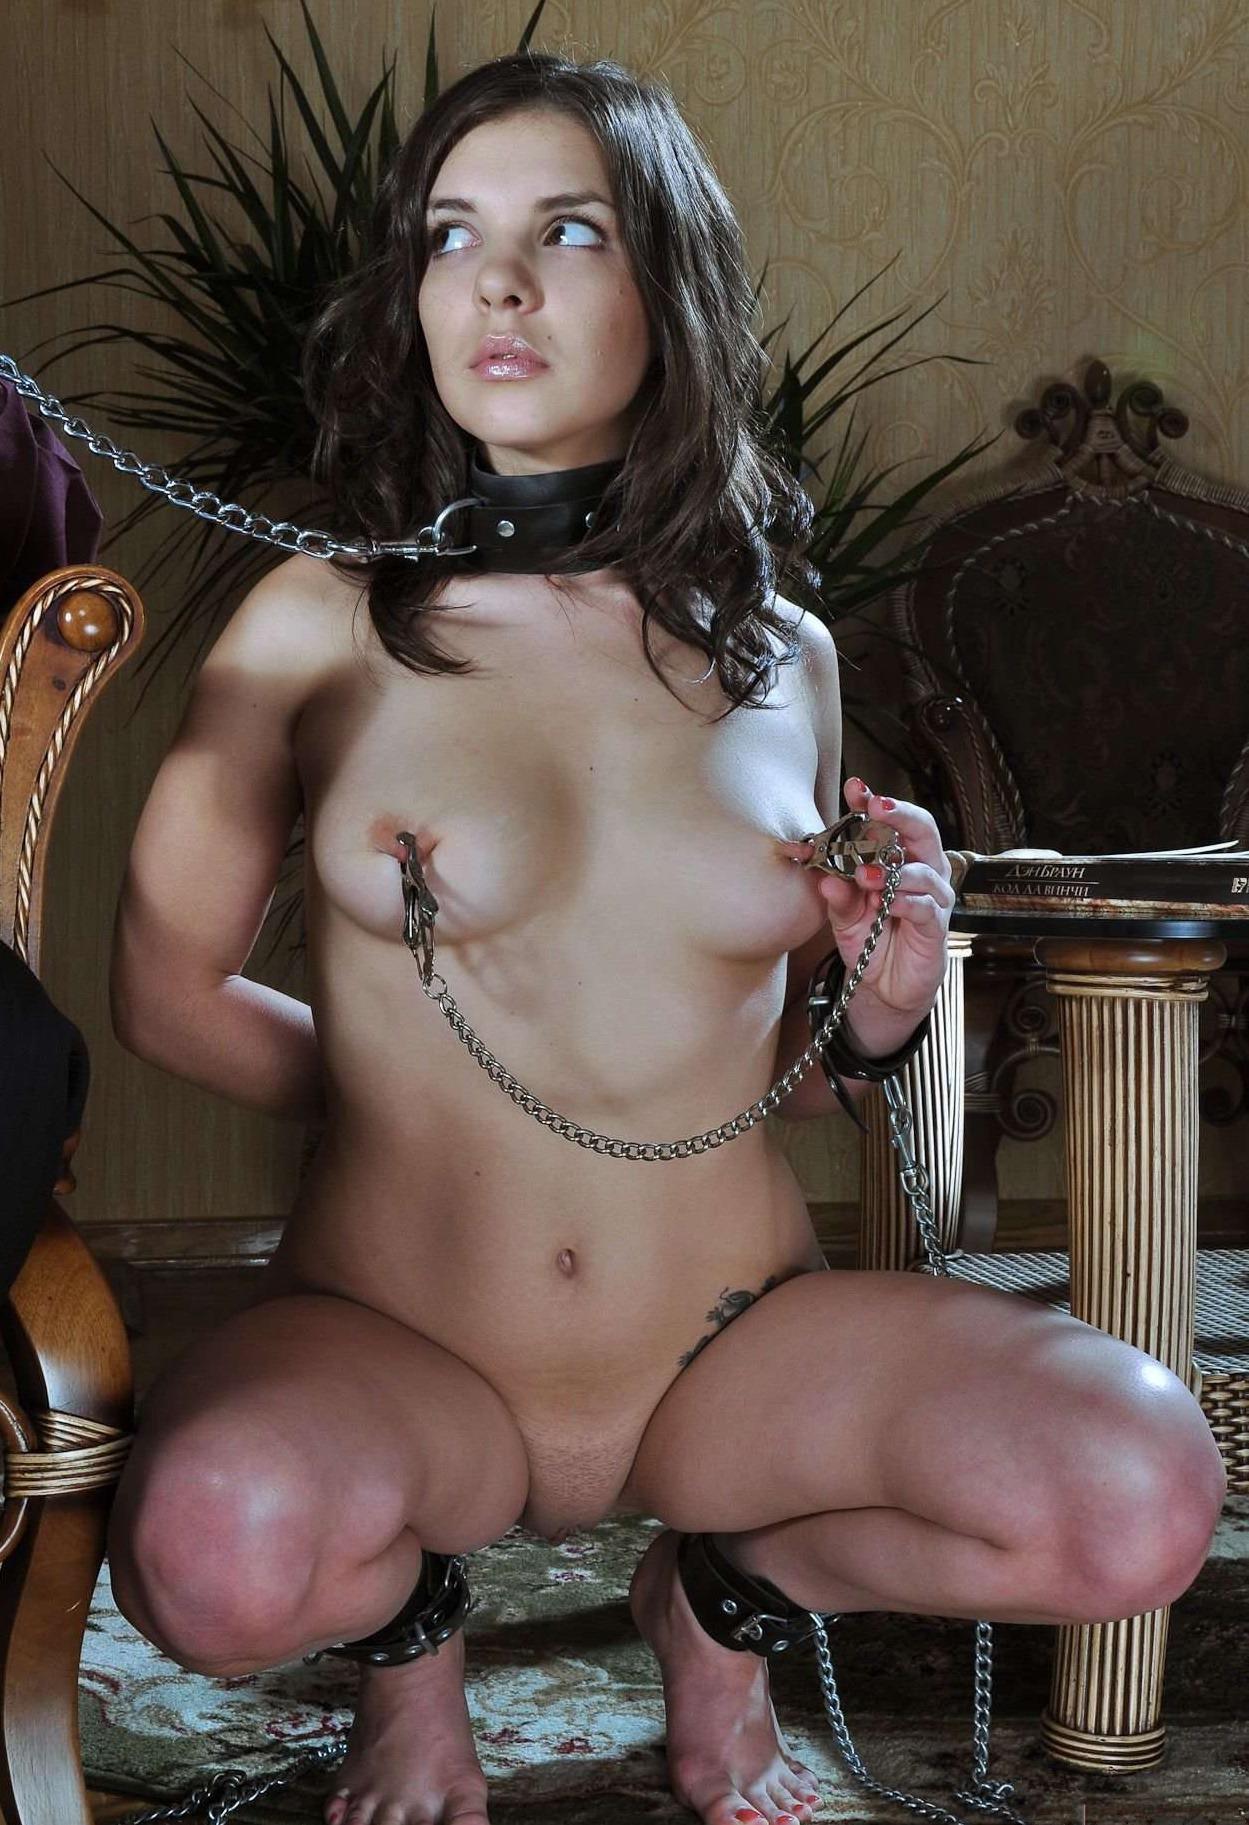 showing images for bad santa tumblr xxx #allfours #allfours #collar #collarandleash #collared #goodgirl #leash #leashandcollar #leashed #naked #nude #nude #pet #petgirl #slave #submissive #zugfav